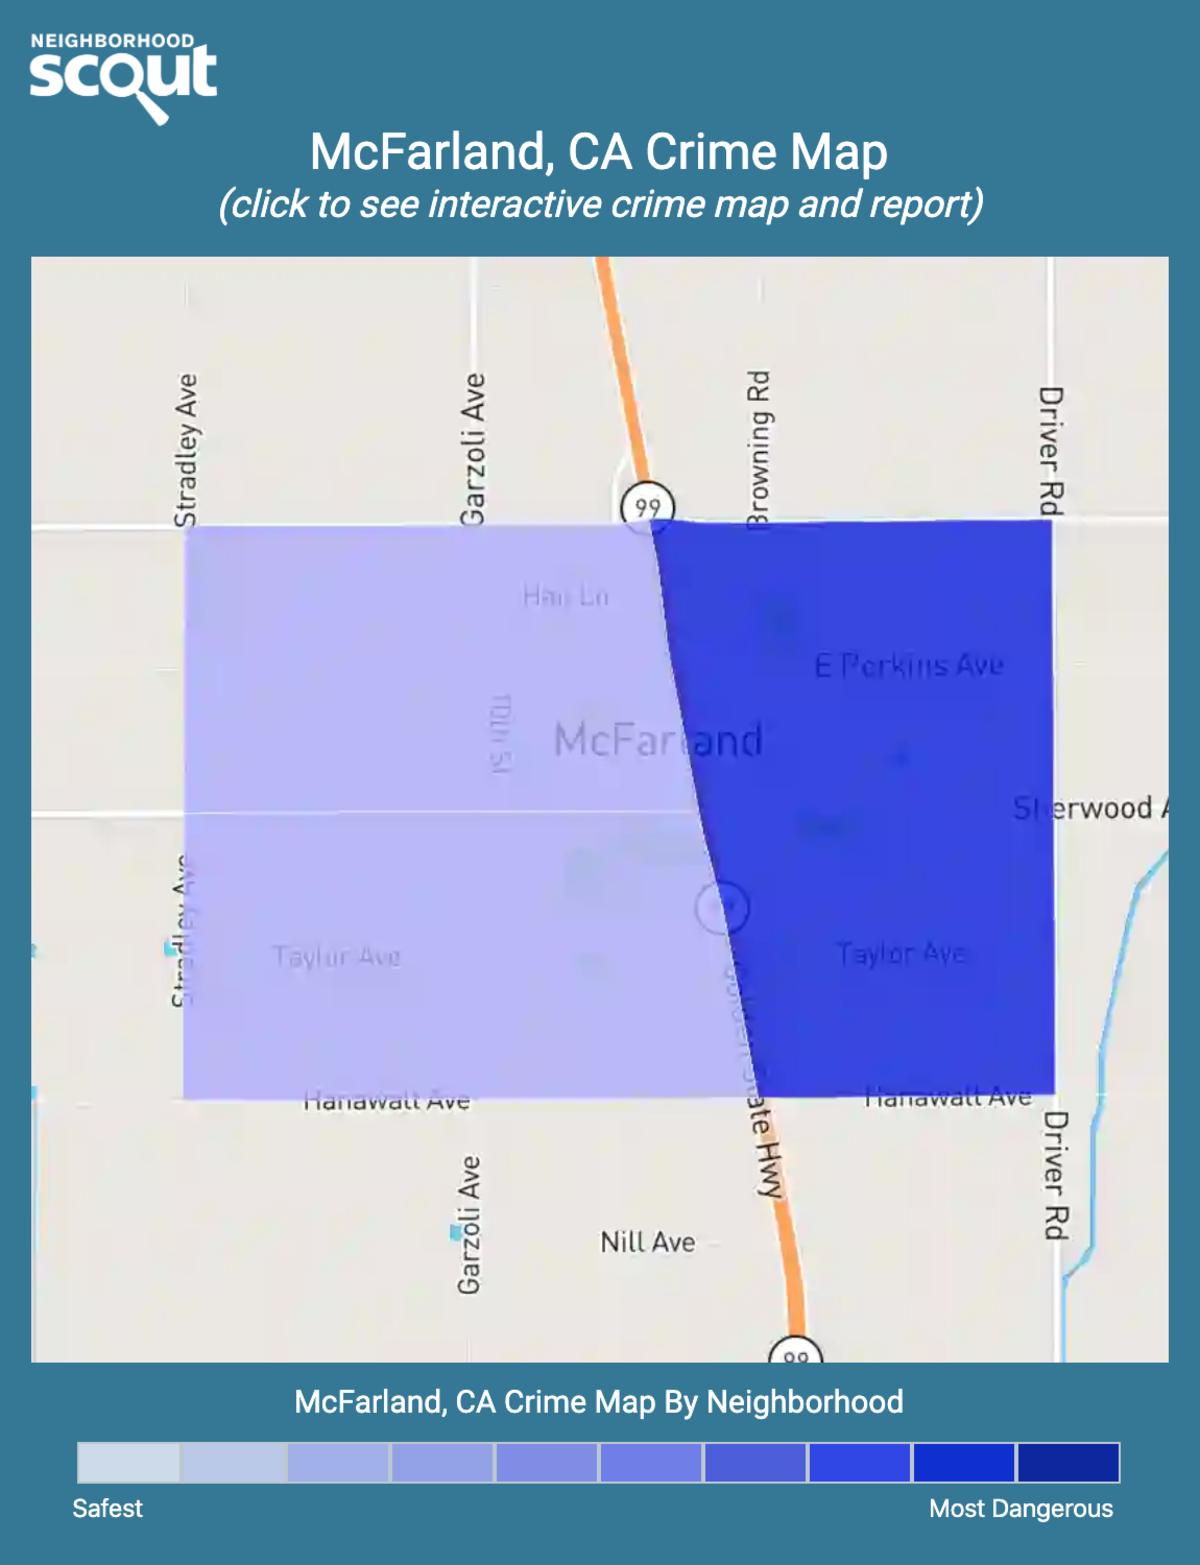 McFarland, CA, 93250 Crime Rates and Crime Statistics ...